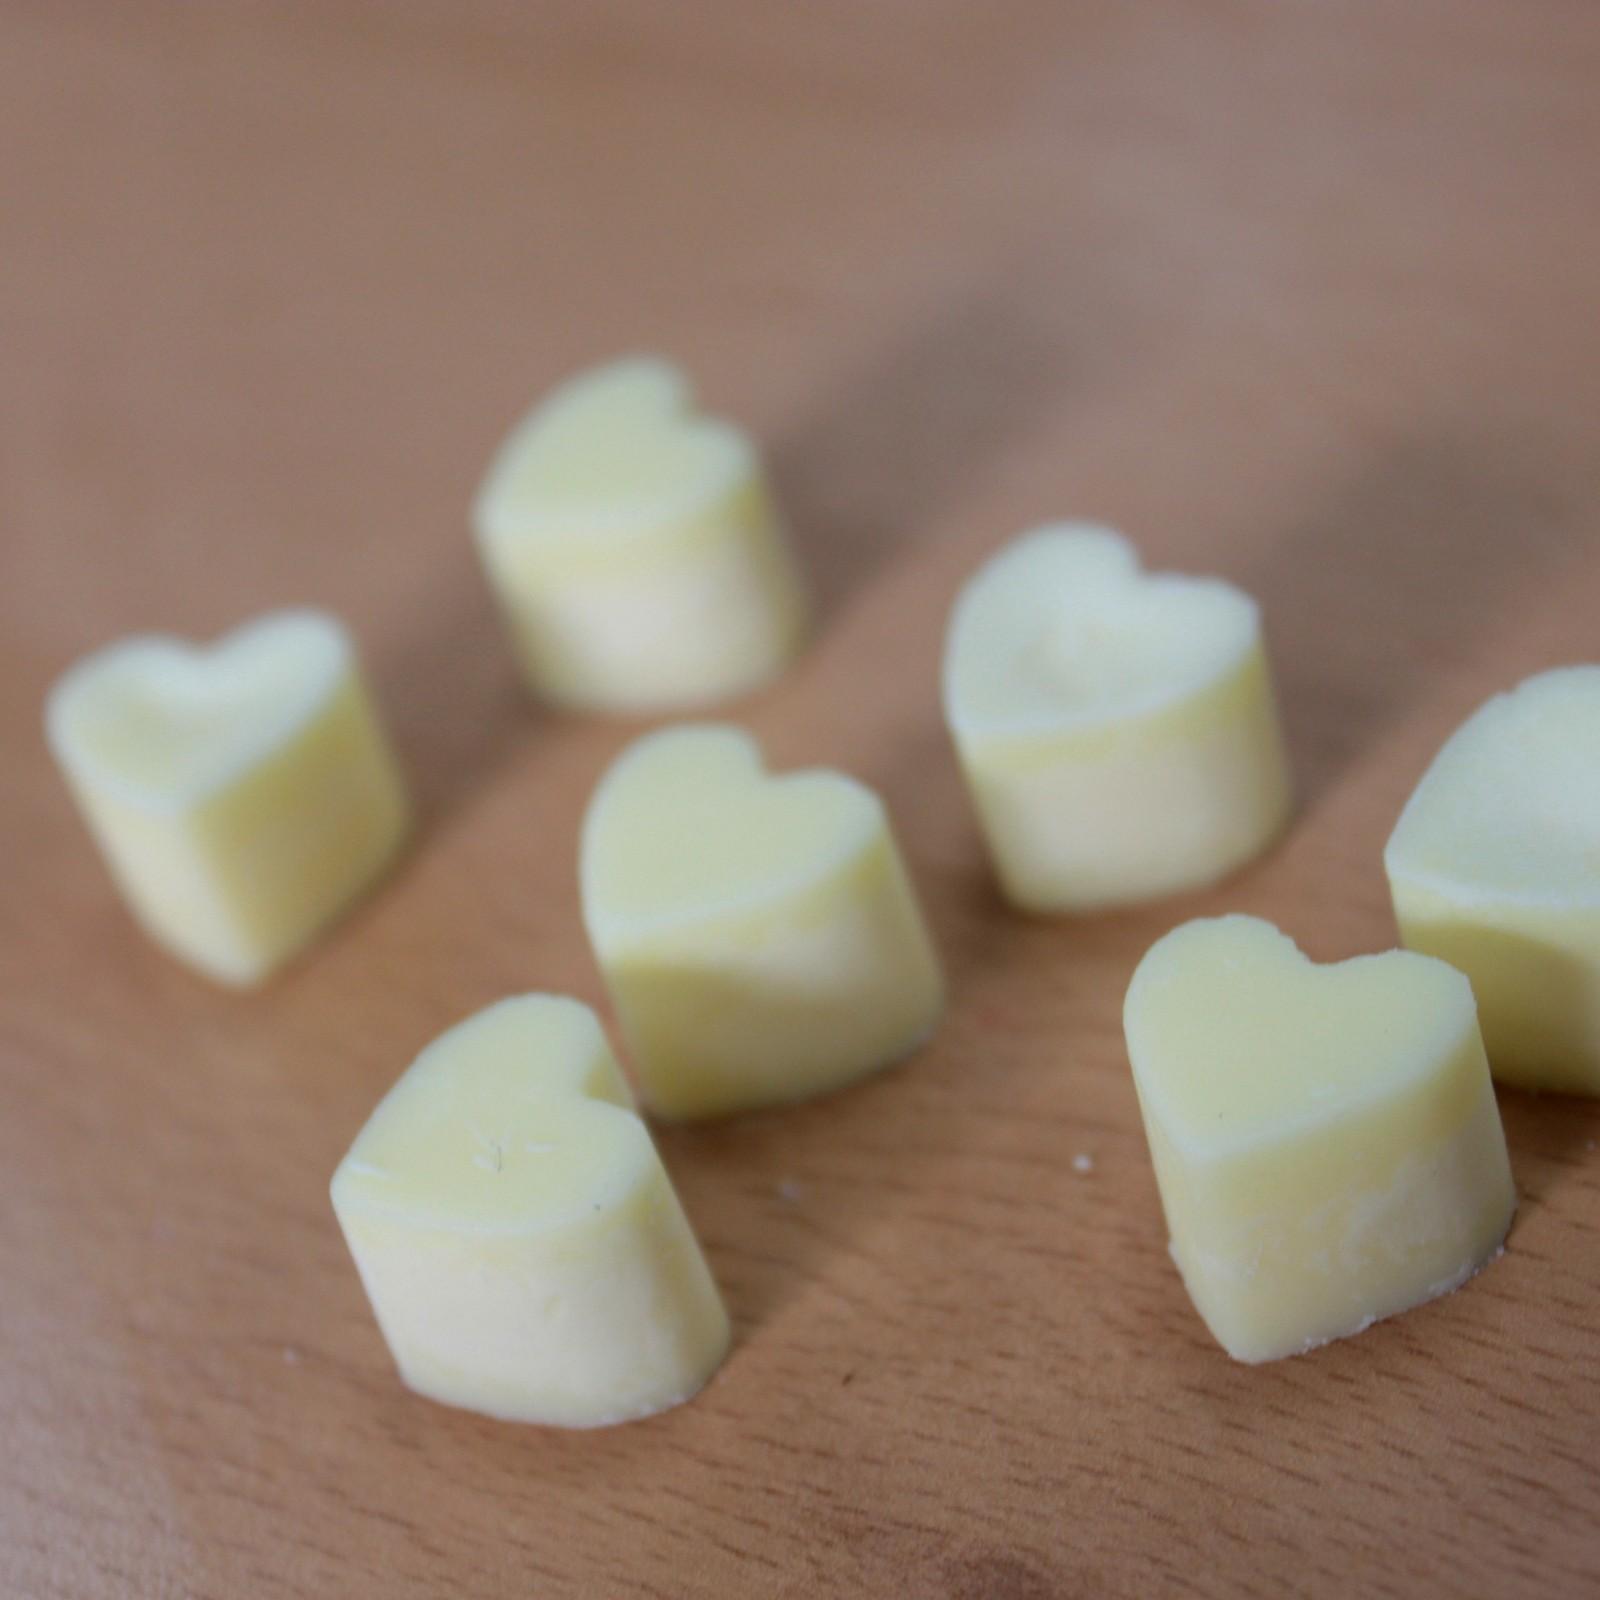 Aroma Wax Melts Nutmeg and Lemon